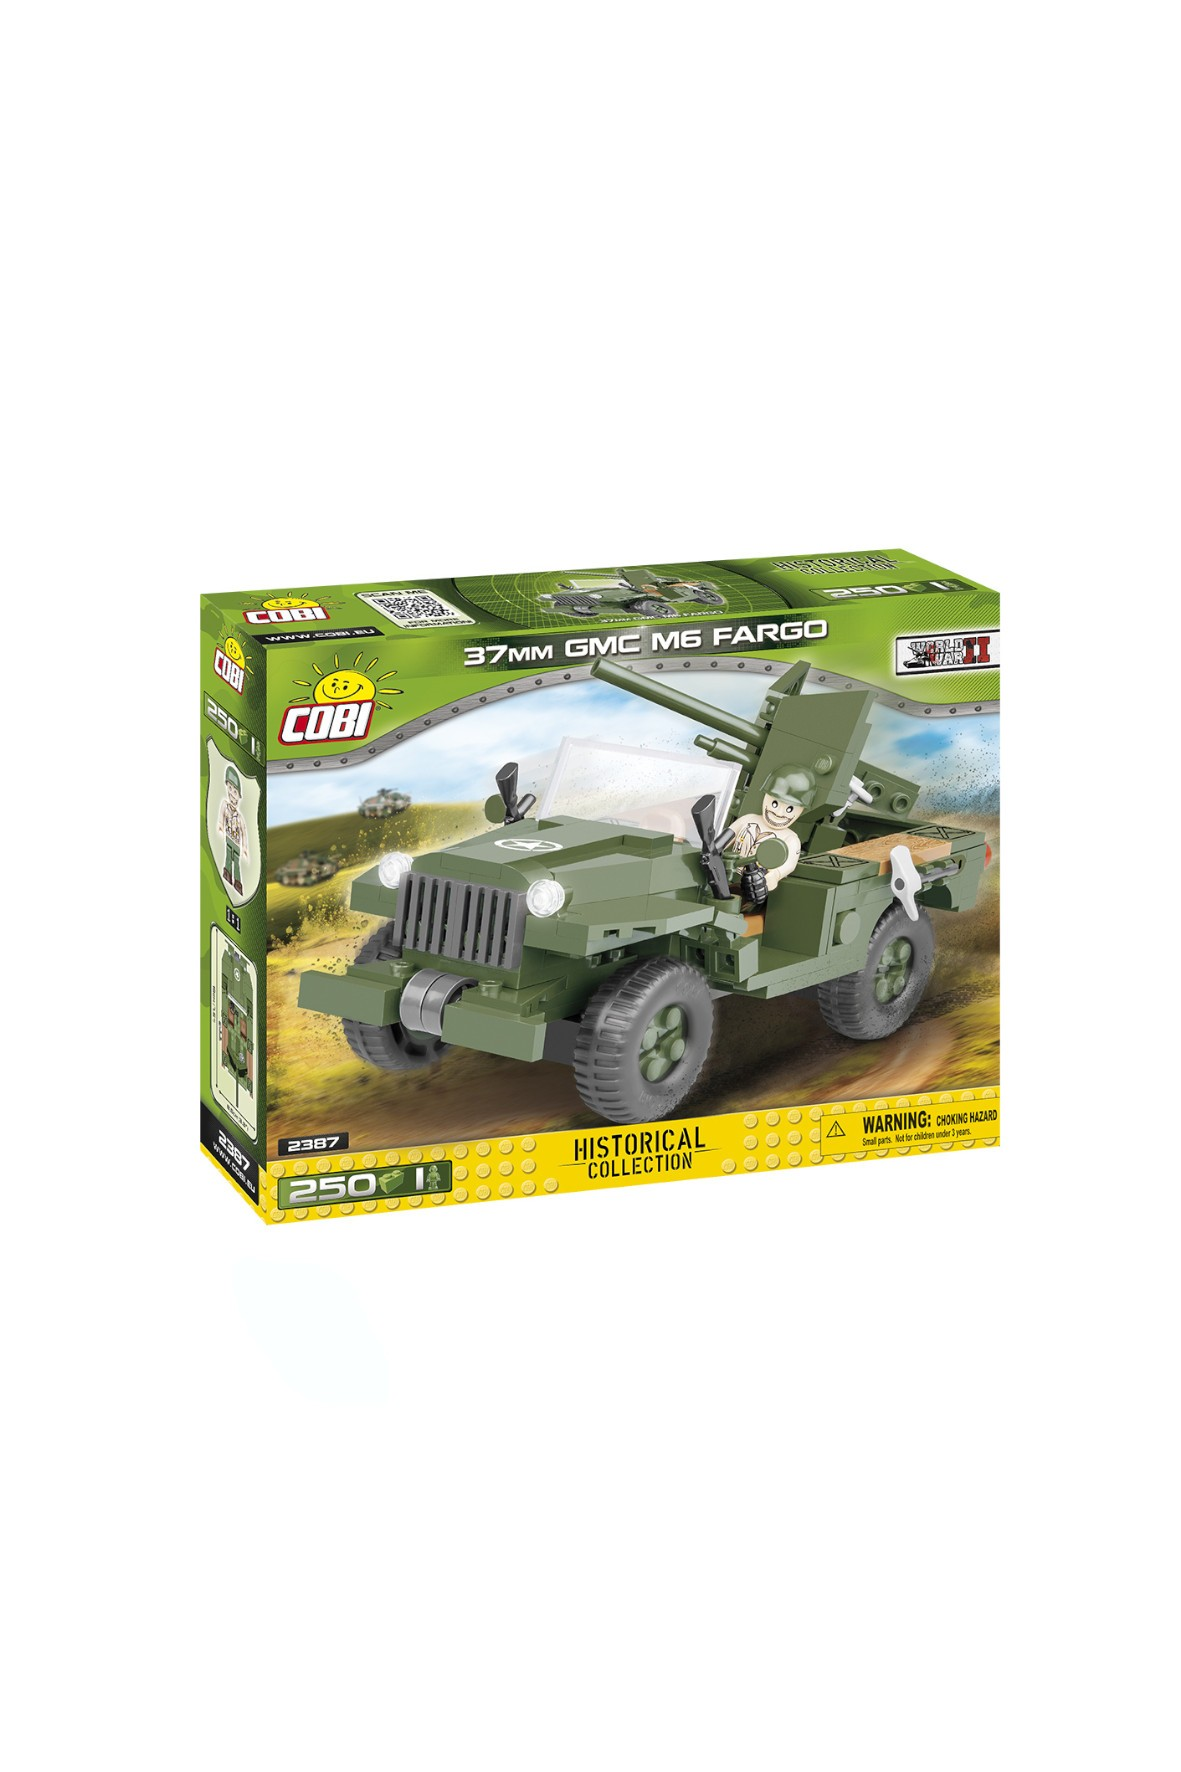 Klocki COBI Small army 2387